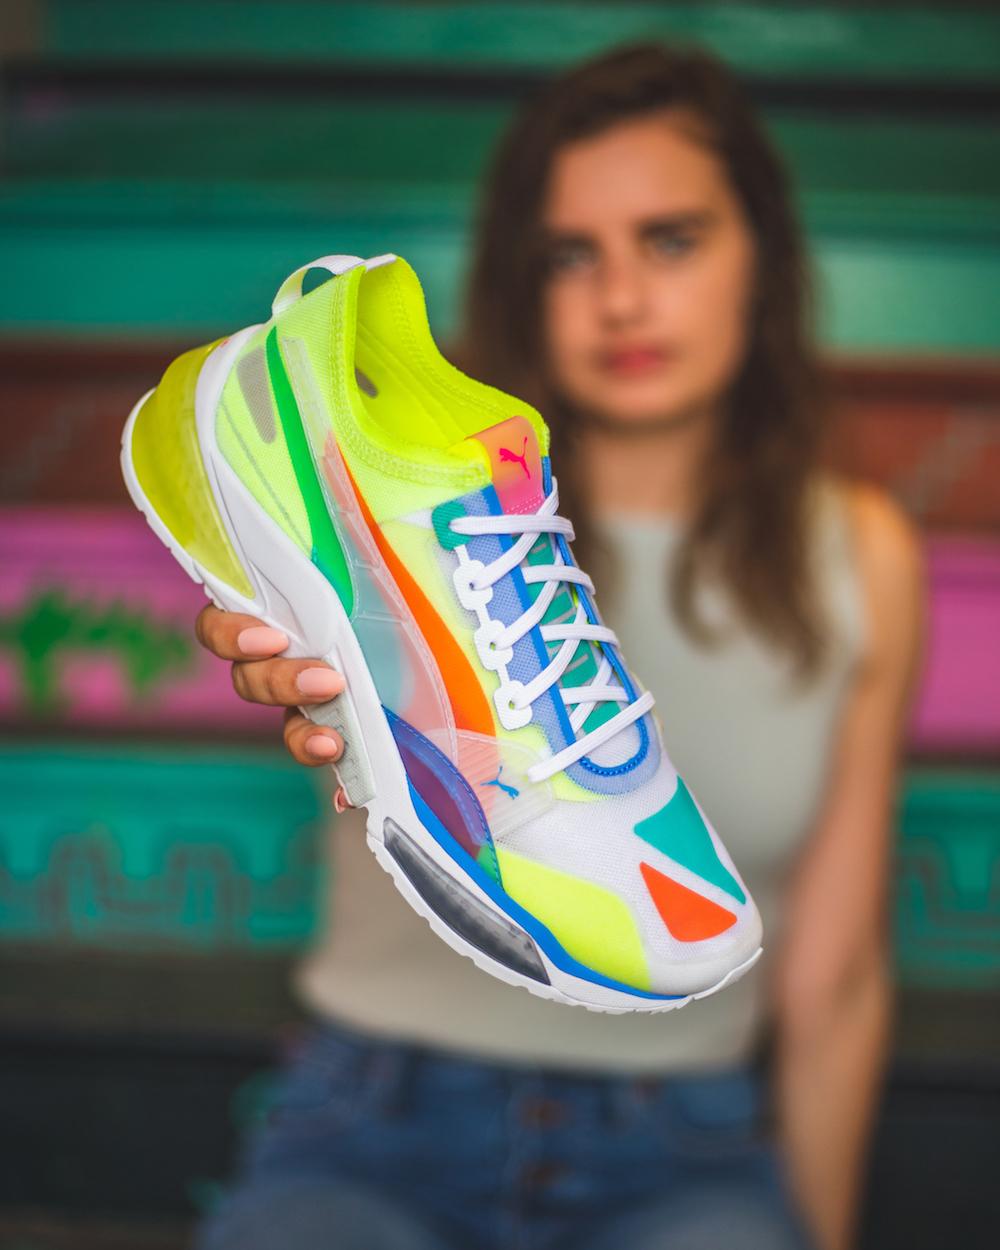 Puma-LQDCELL-Optic-Sheer. +80 Most Inspiring Workout Shoes Ideas for Women